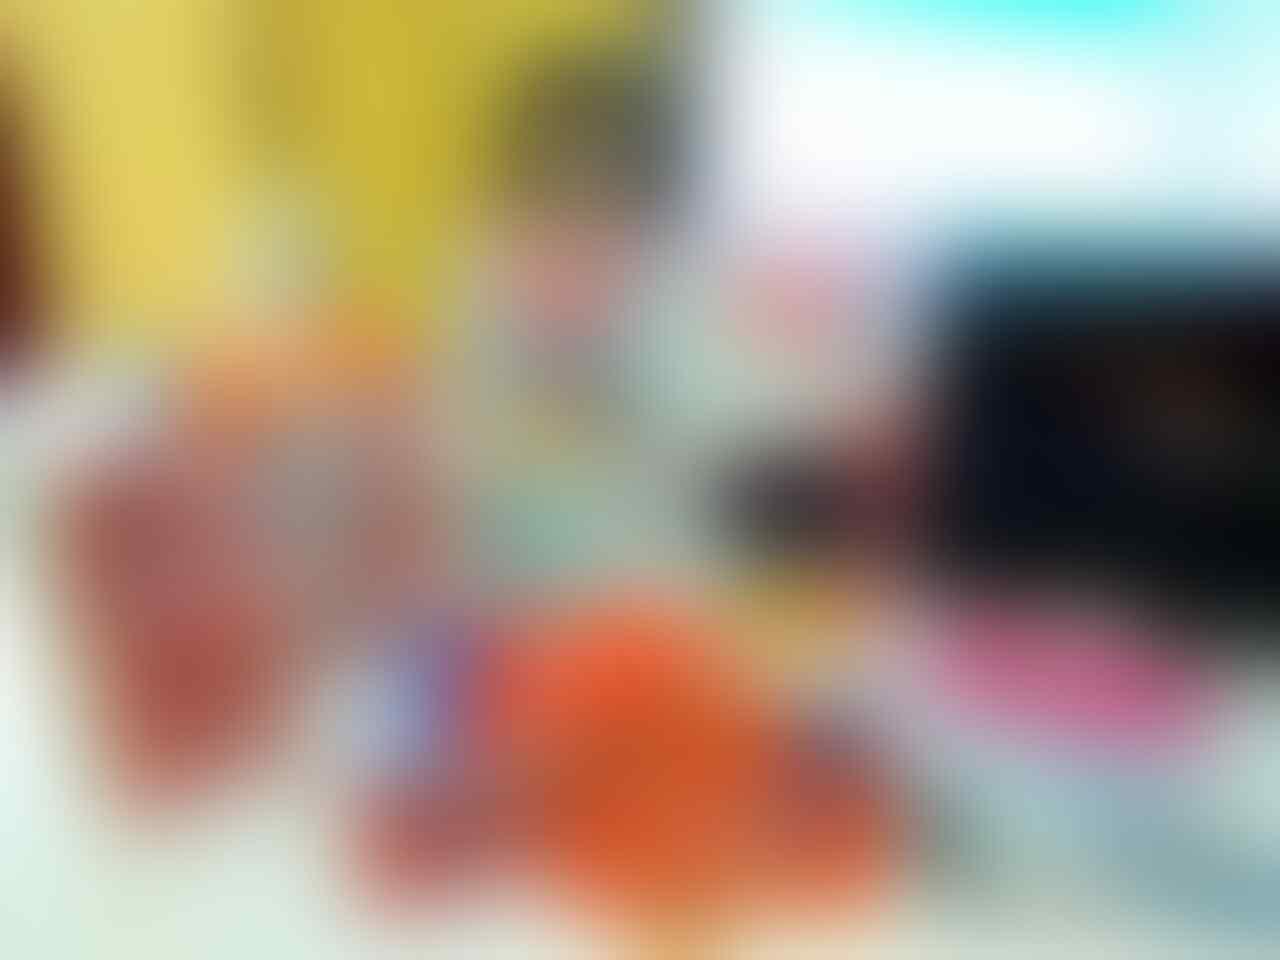 SAMPE PUAS ~ KARTU PERDANA BOLT 8GB - MODEM BOLT UNLOCK ORION - MAX -SLIM 2